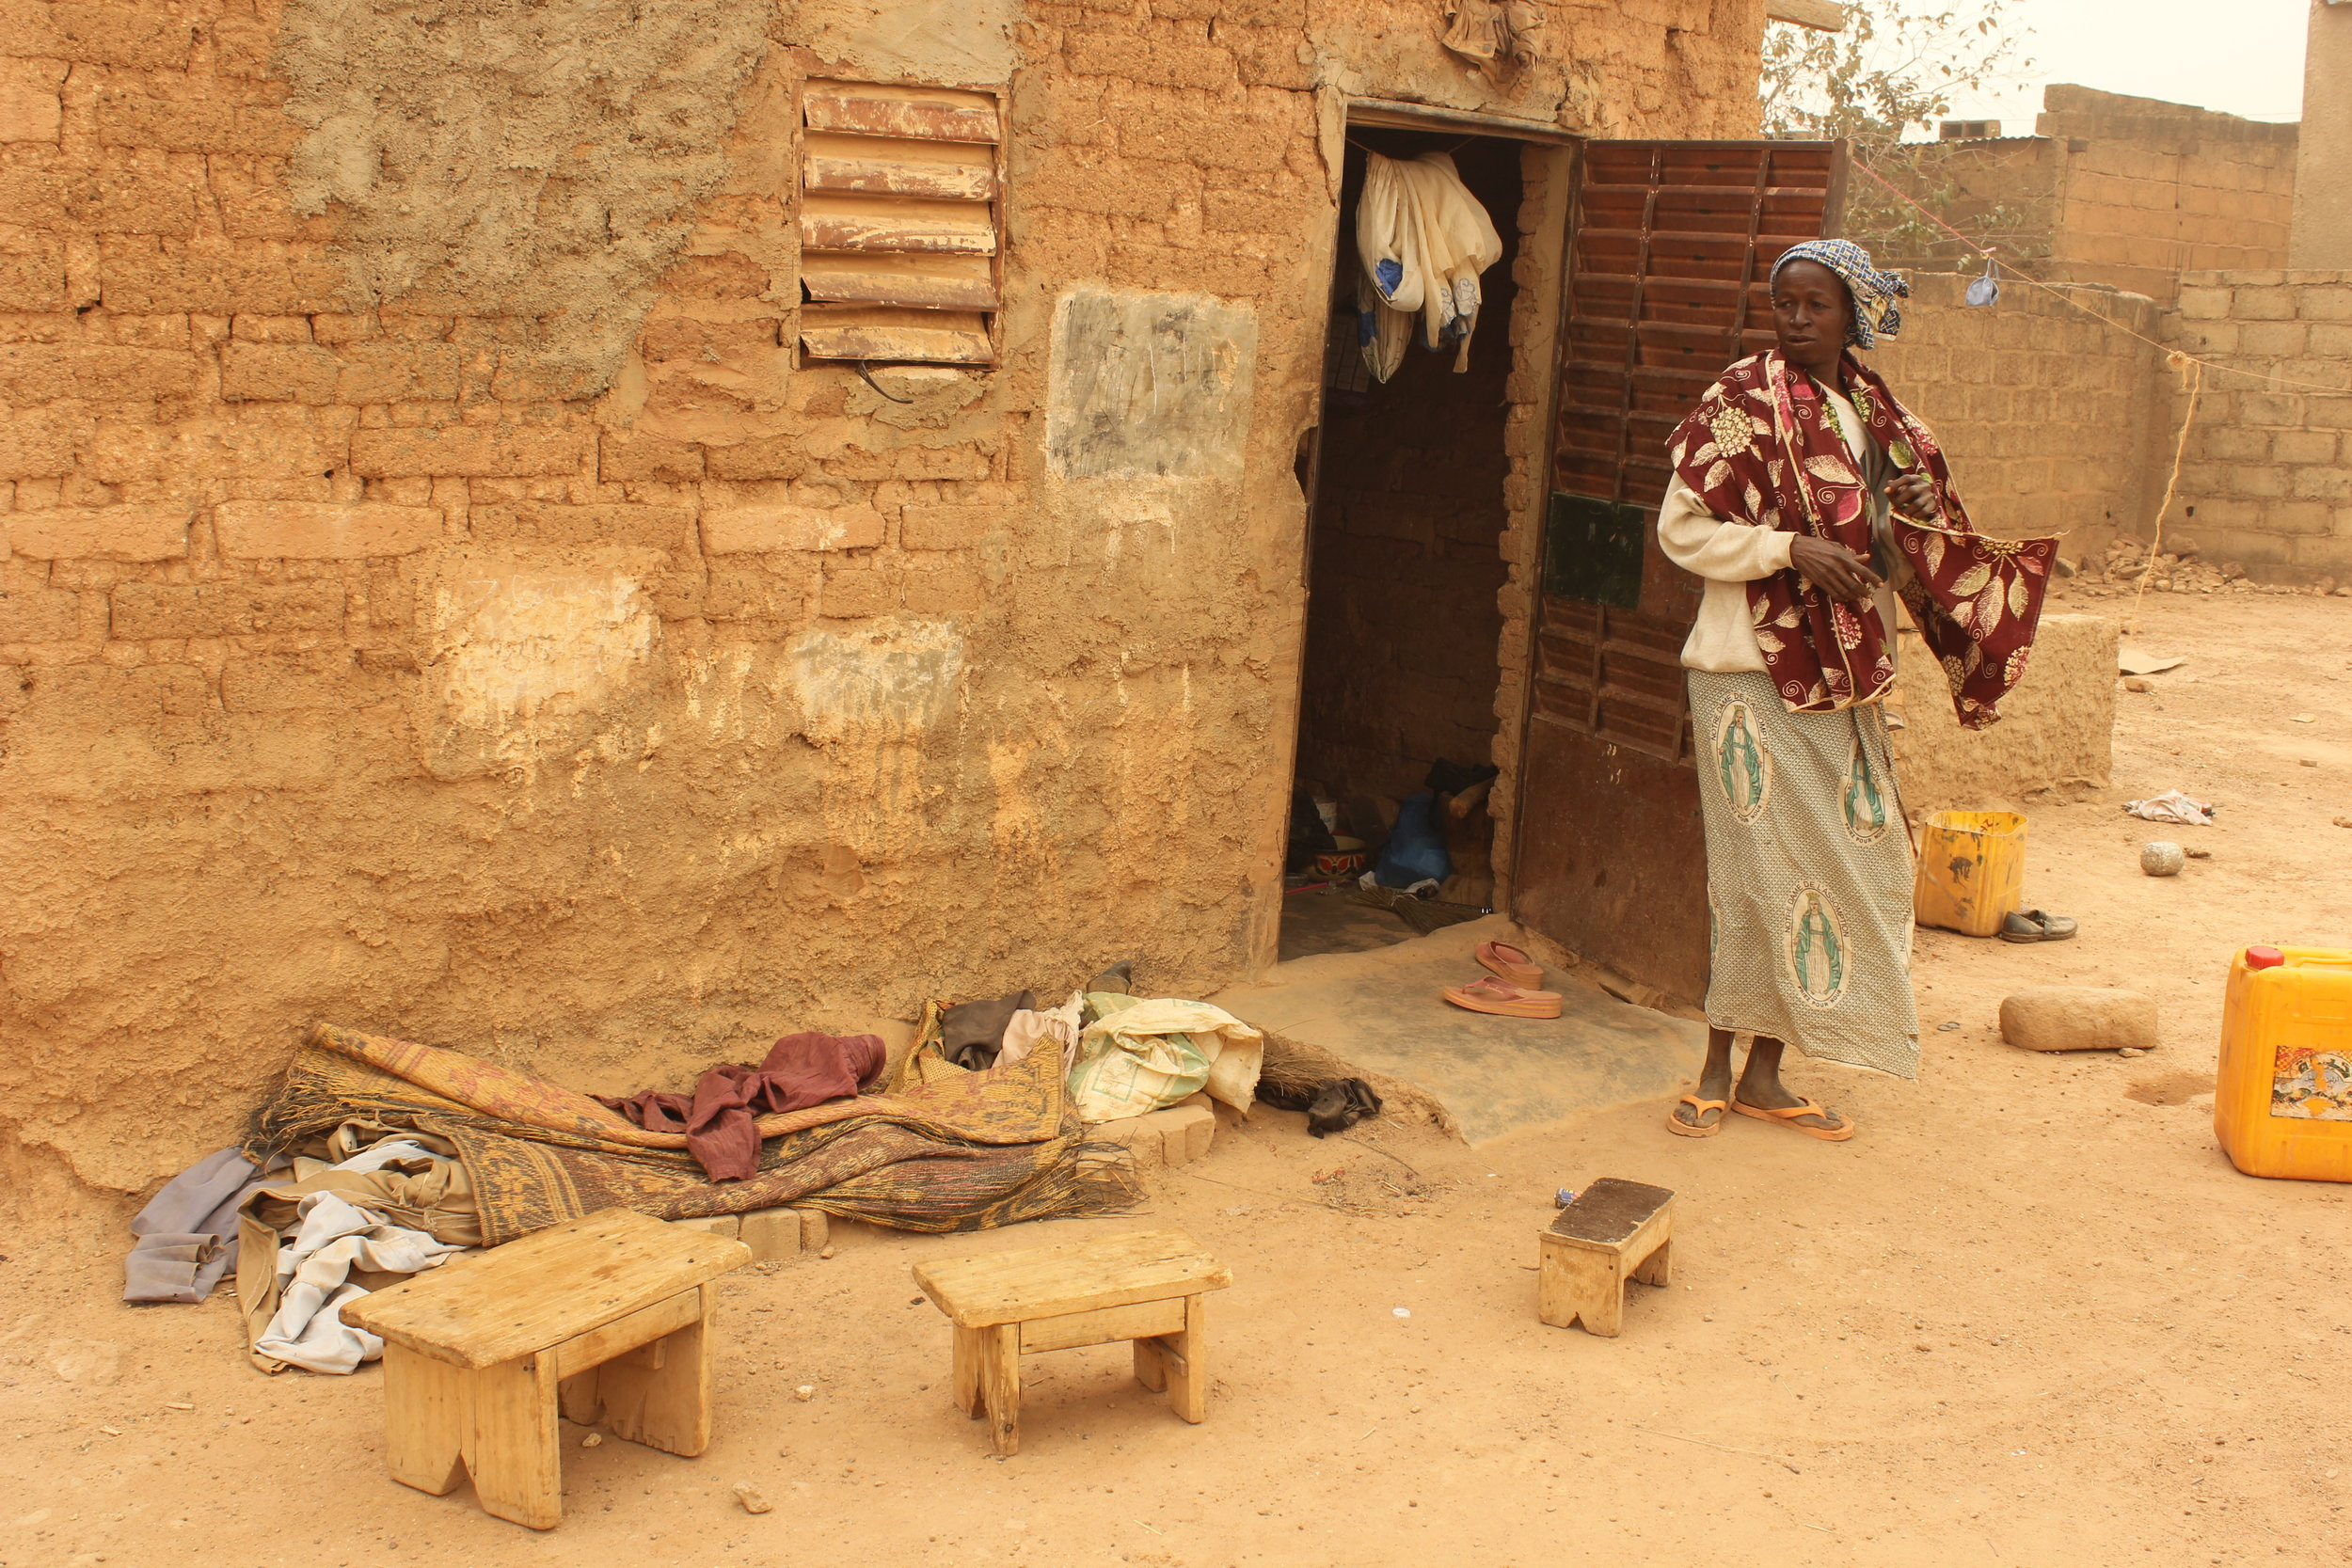 Gallery … - … of life in Burkina Faso